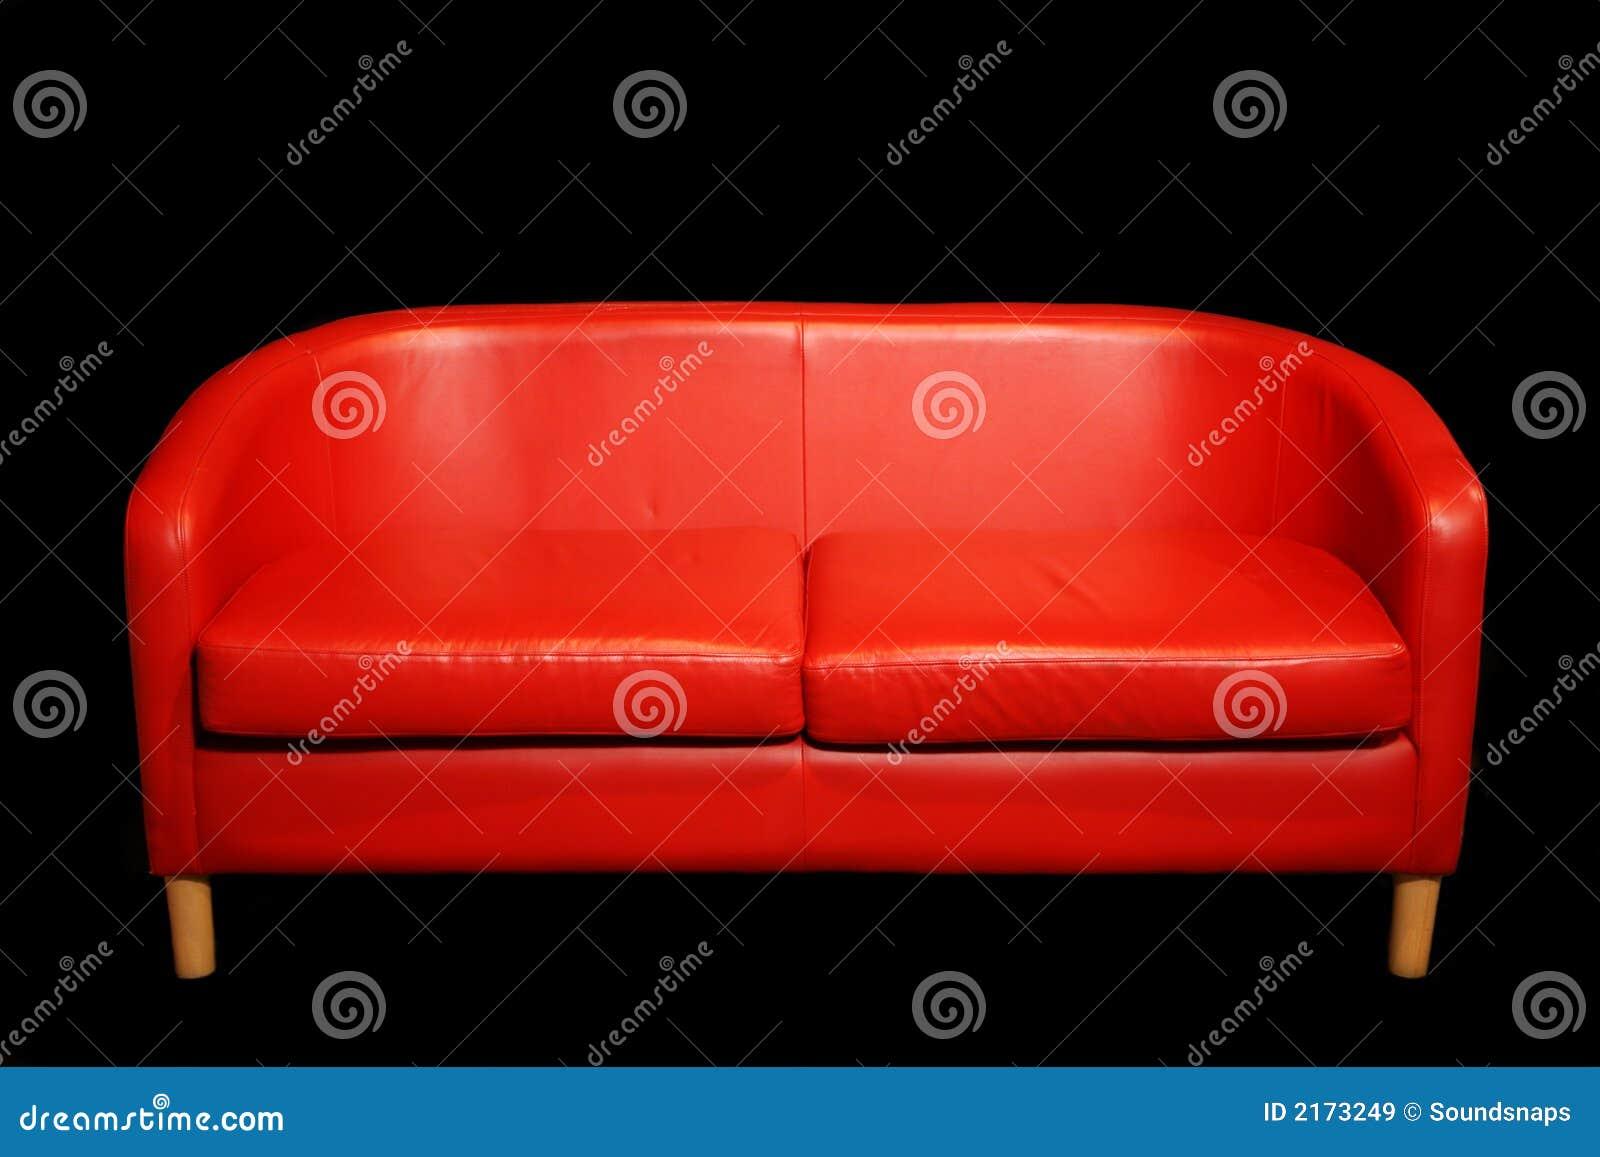 Retro Red Sofa In Dark Room Stock Image - Image of look ...